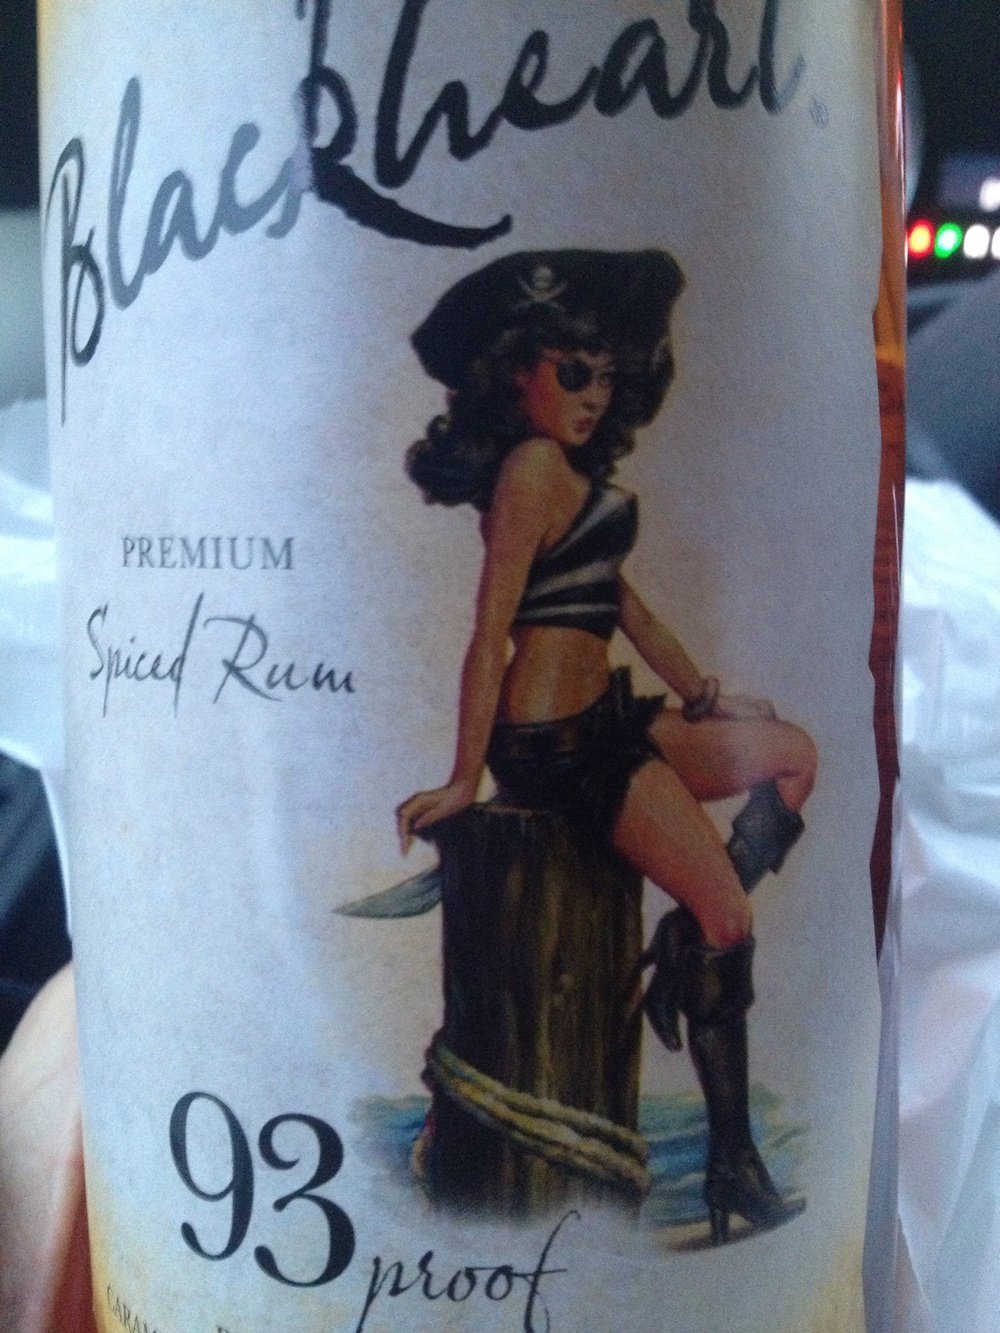 I found a new rum! Yum!